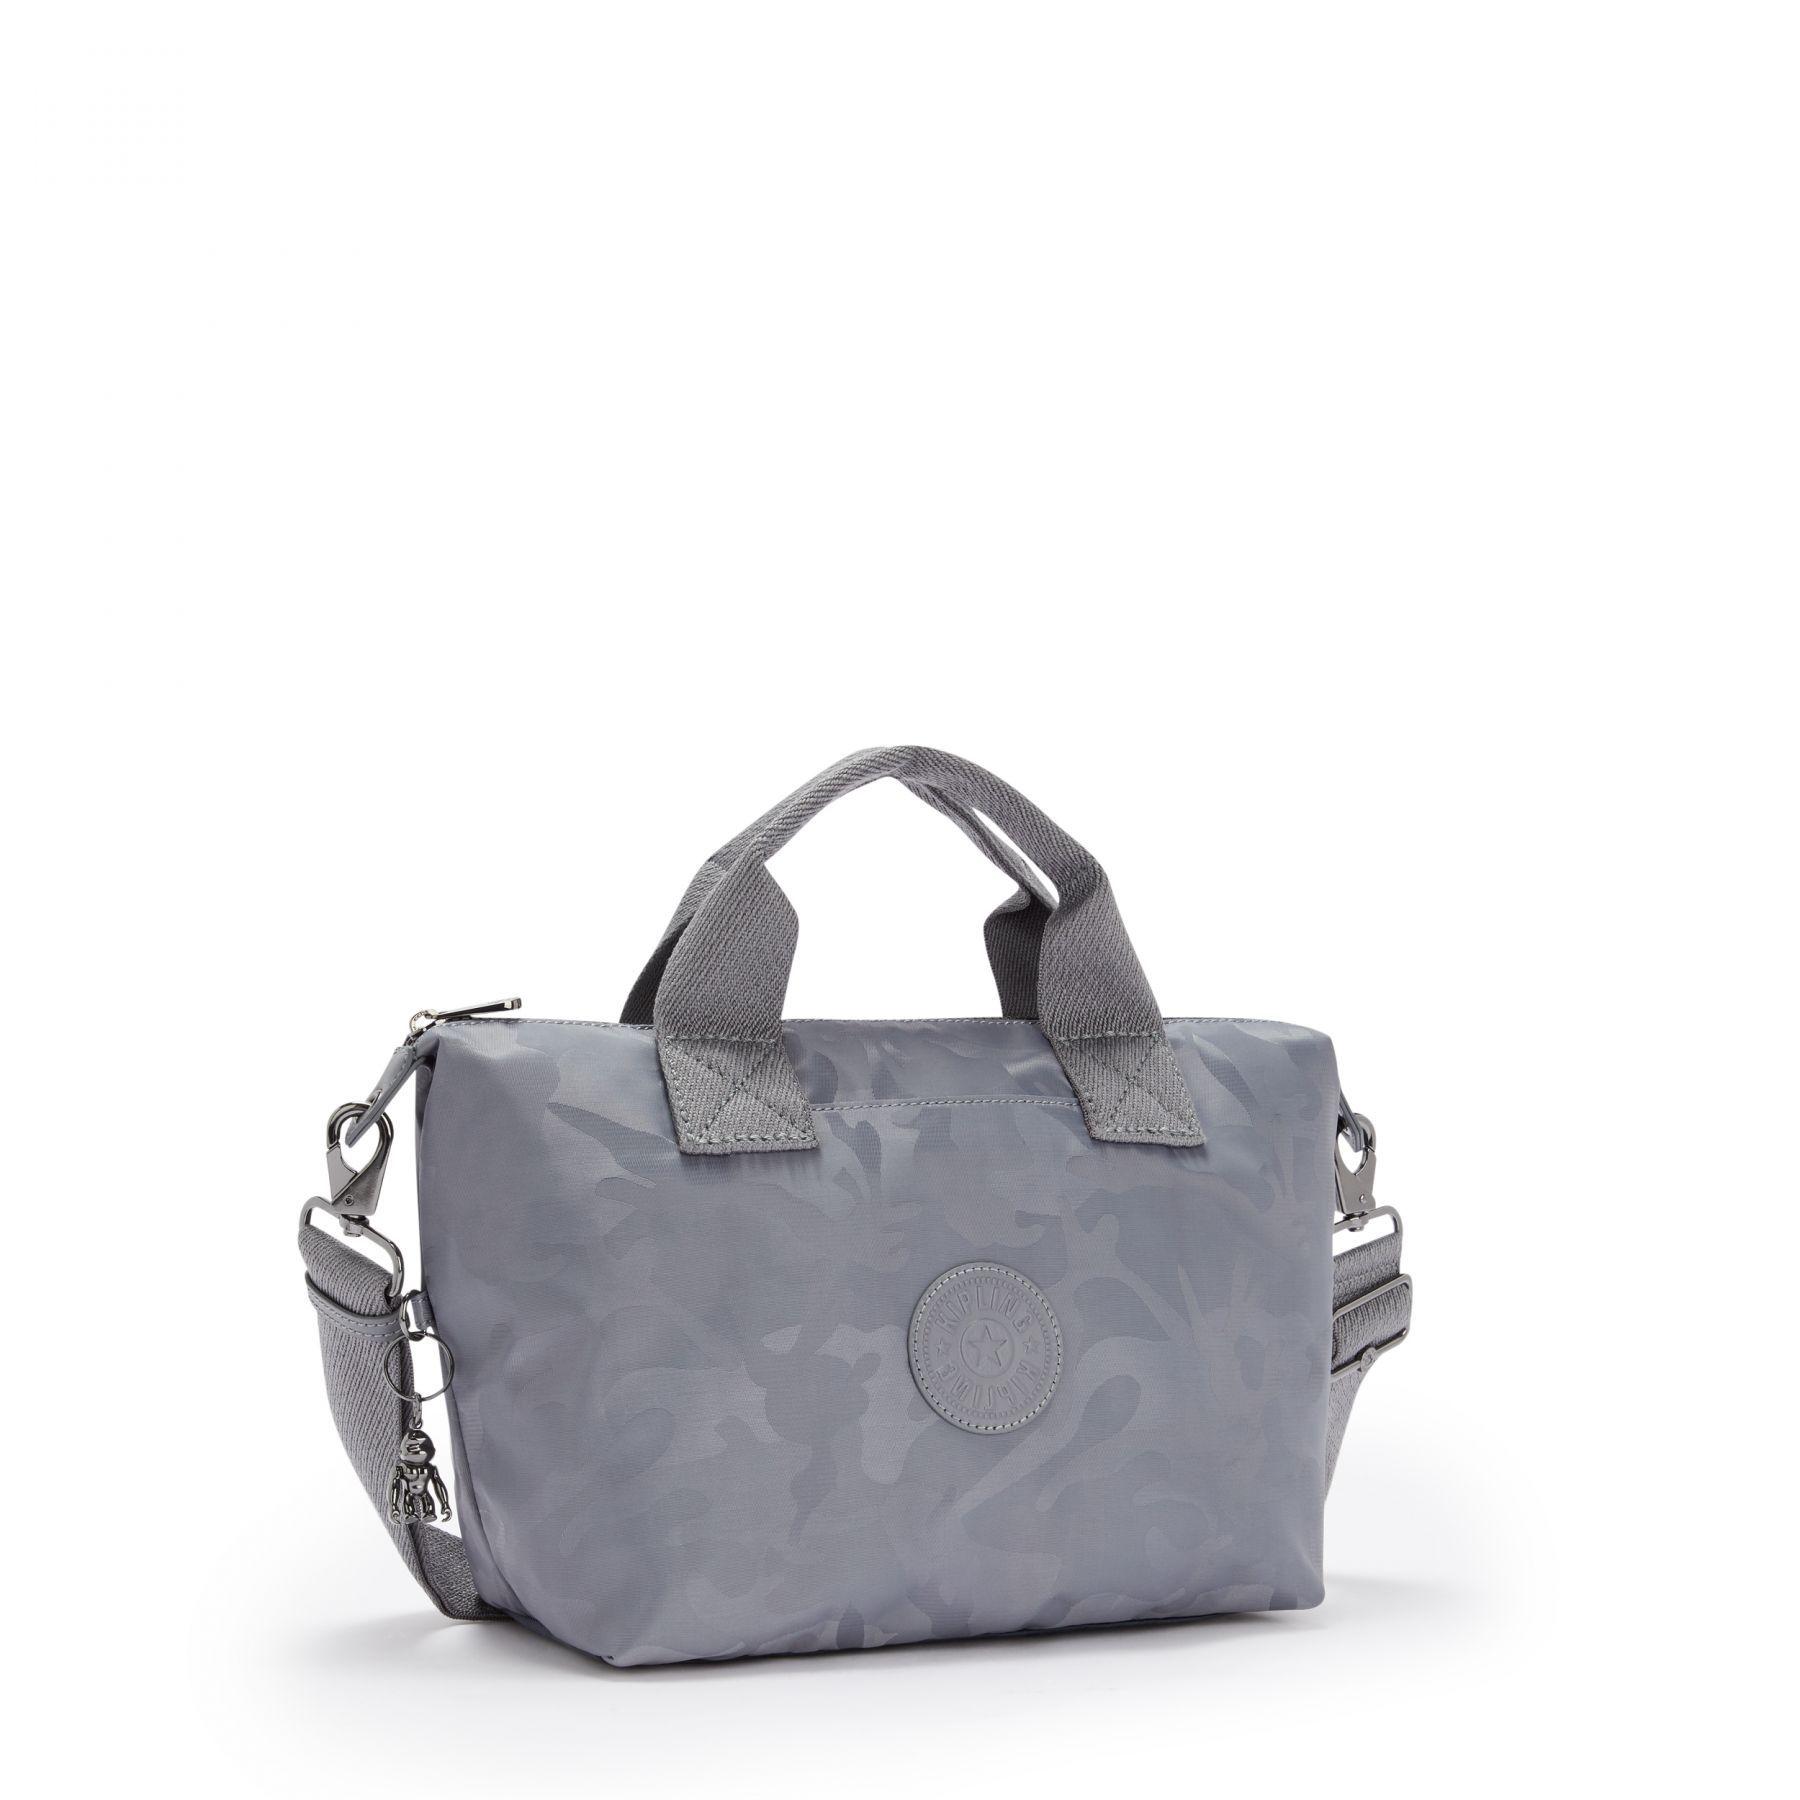 Bolsa Pequena Kala Kipling Grey Camo Jq